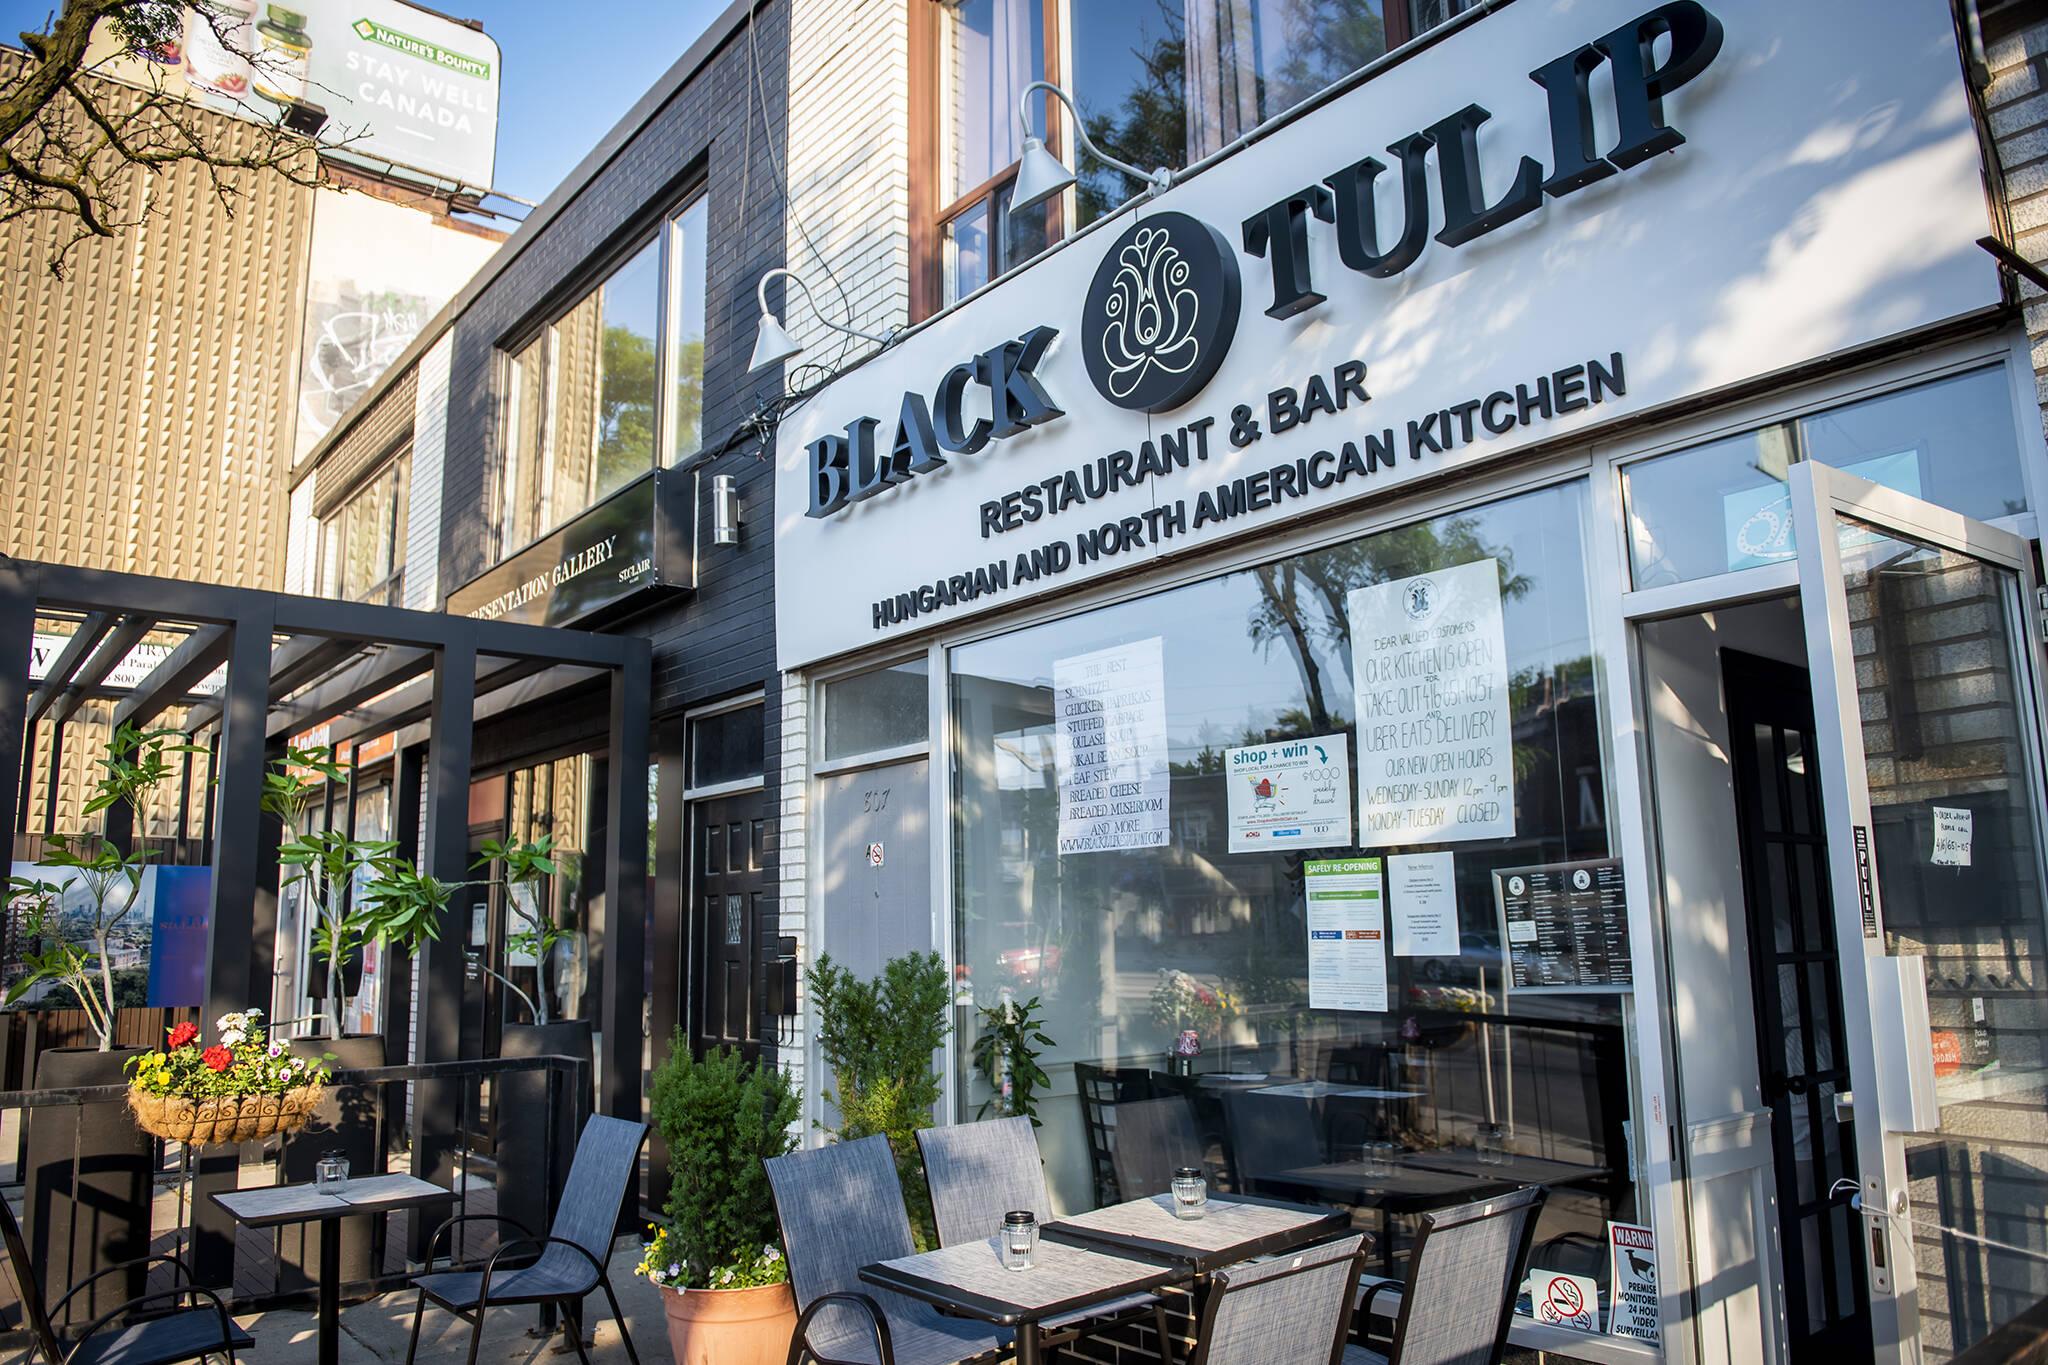 Black Tulip Toronto